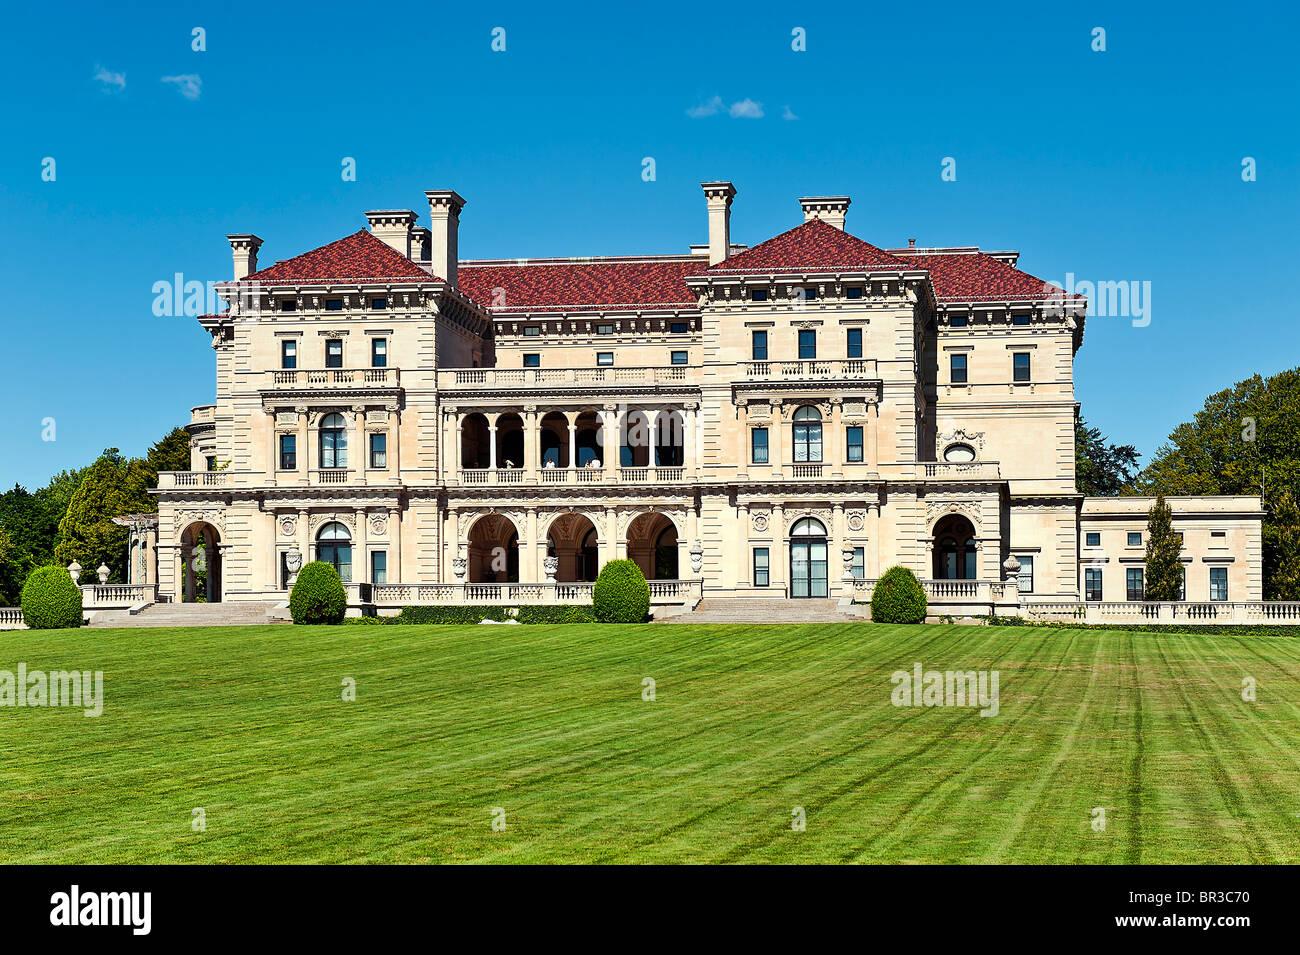 The Breakers mansion, Cliff walk, Newport, Rhode Island, USA - Stock Image